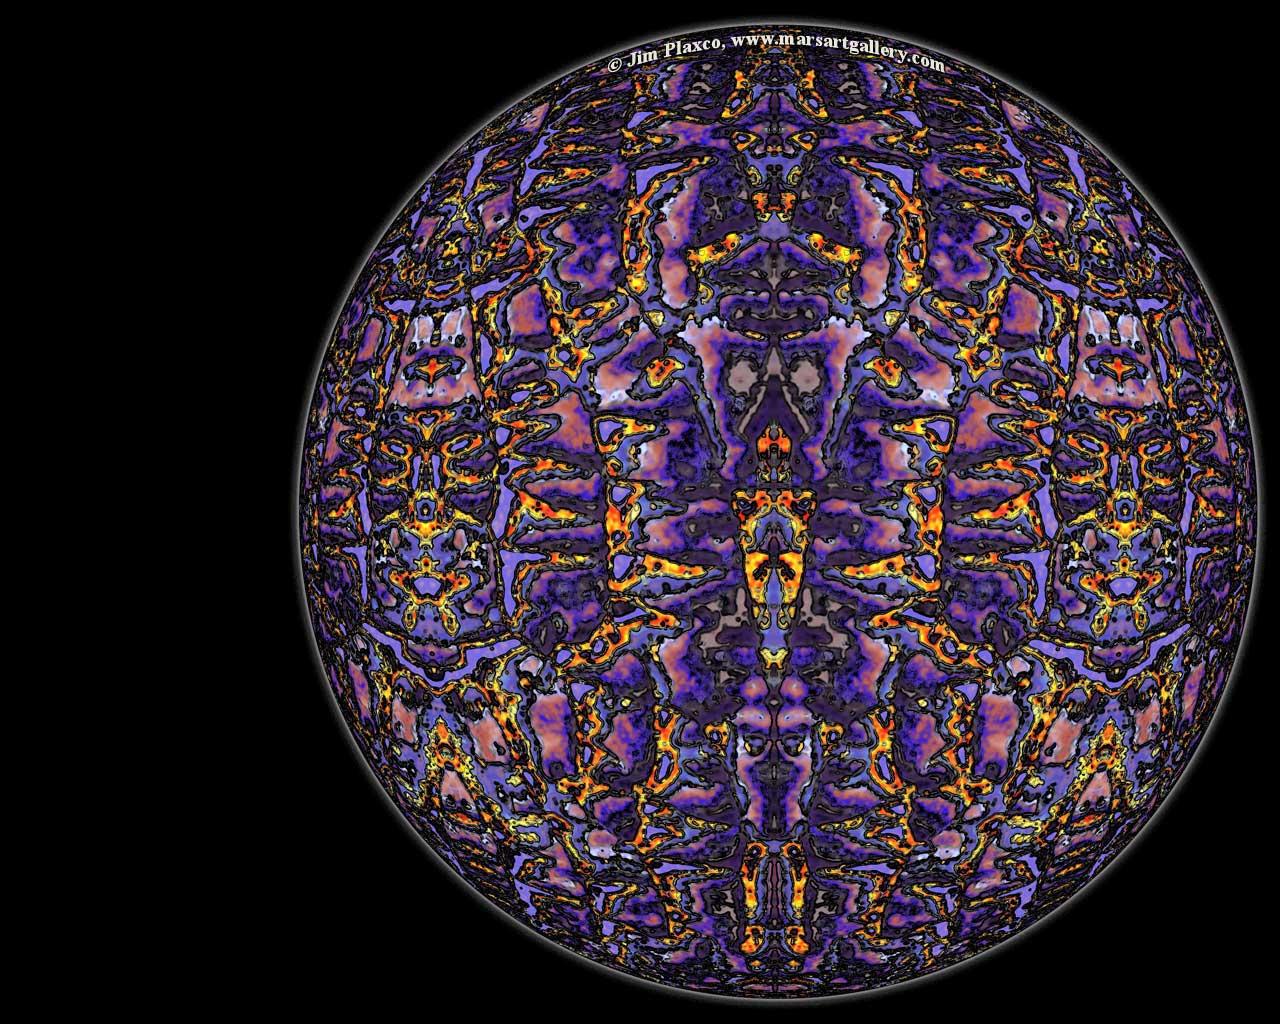 Mandala Backgrounds Wallpapers 1280x1024